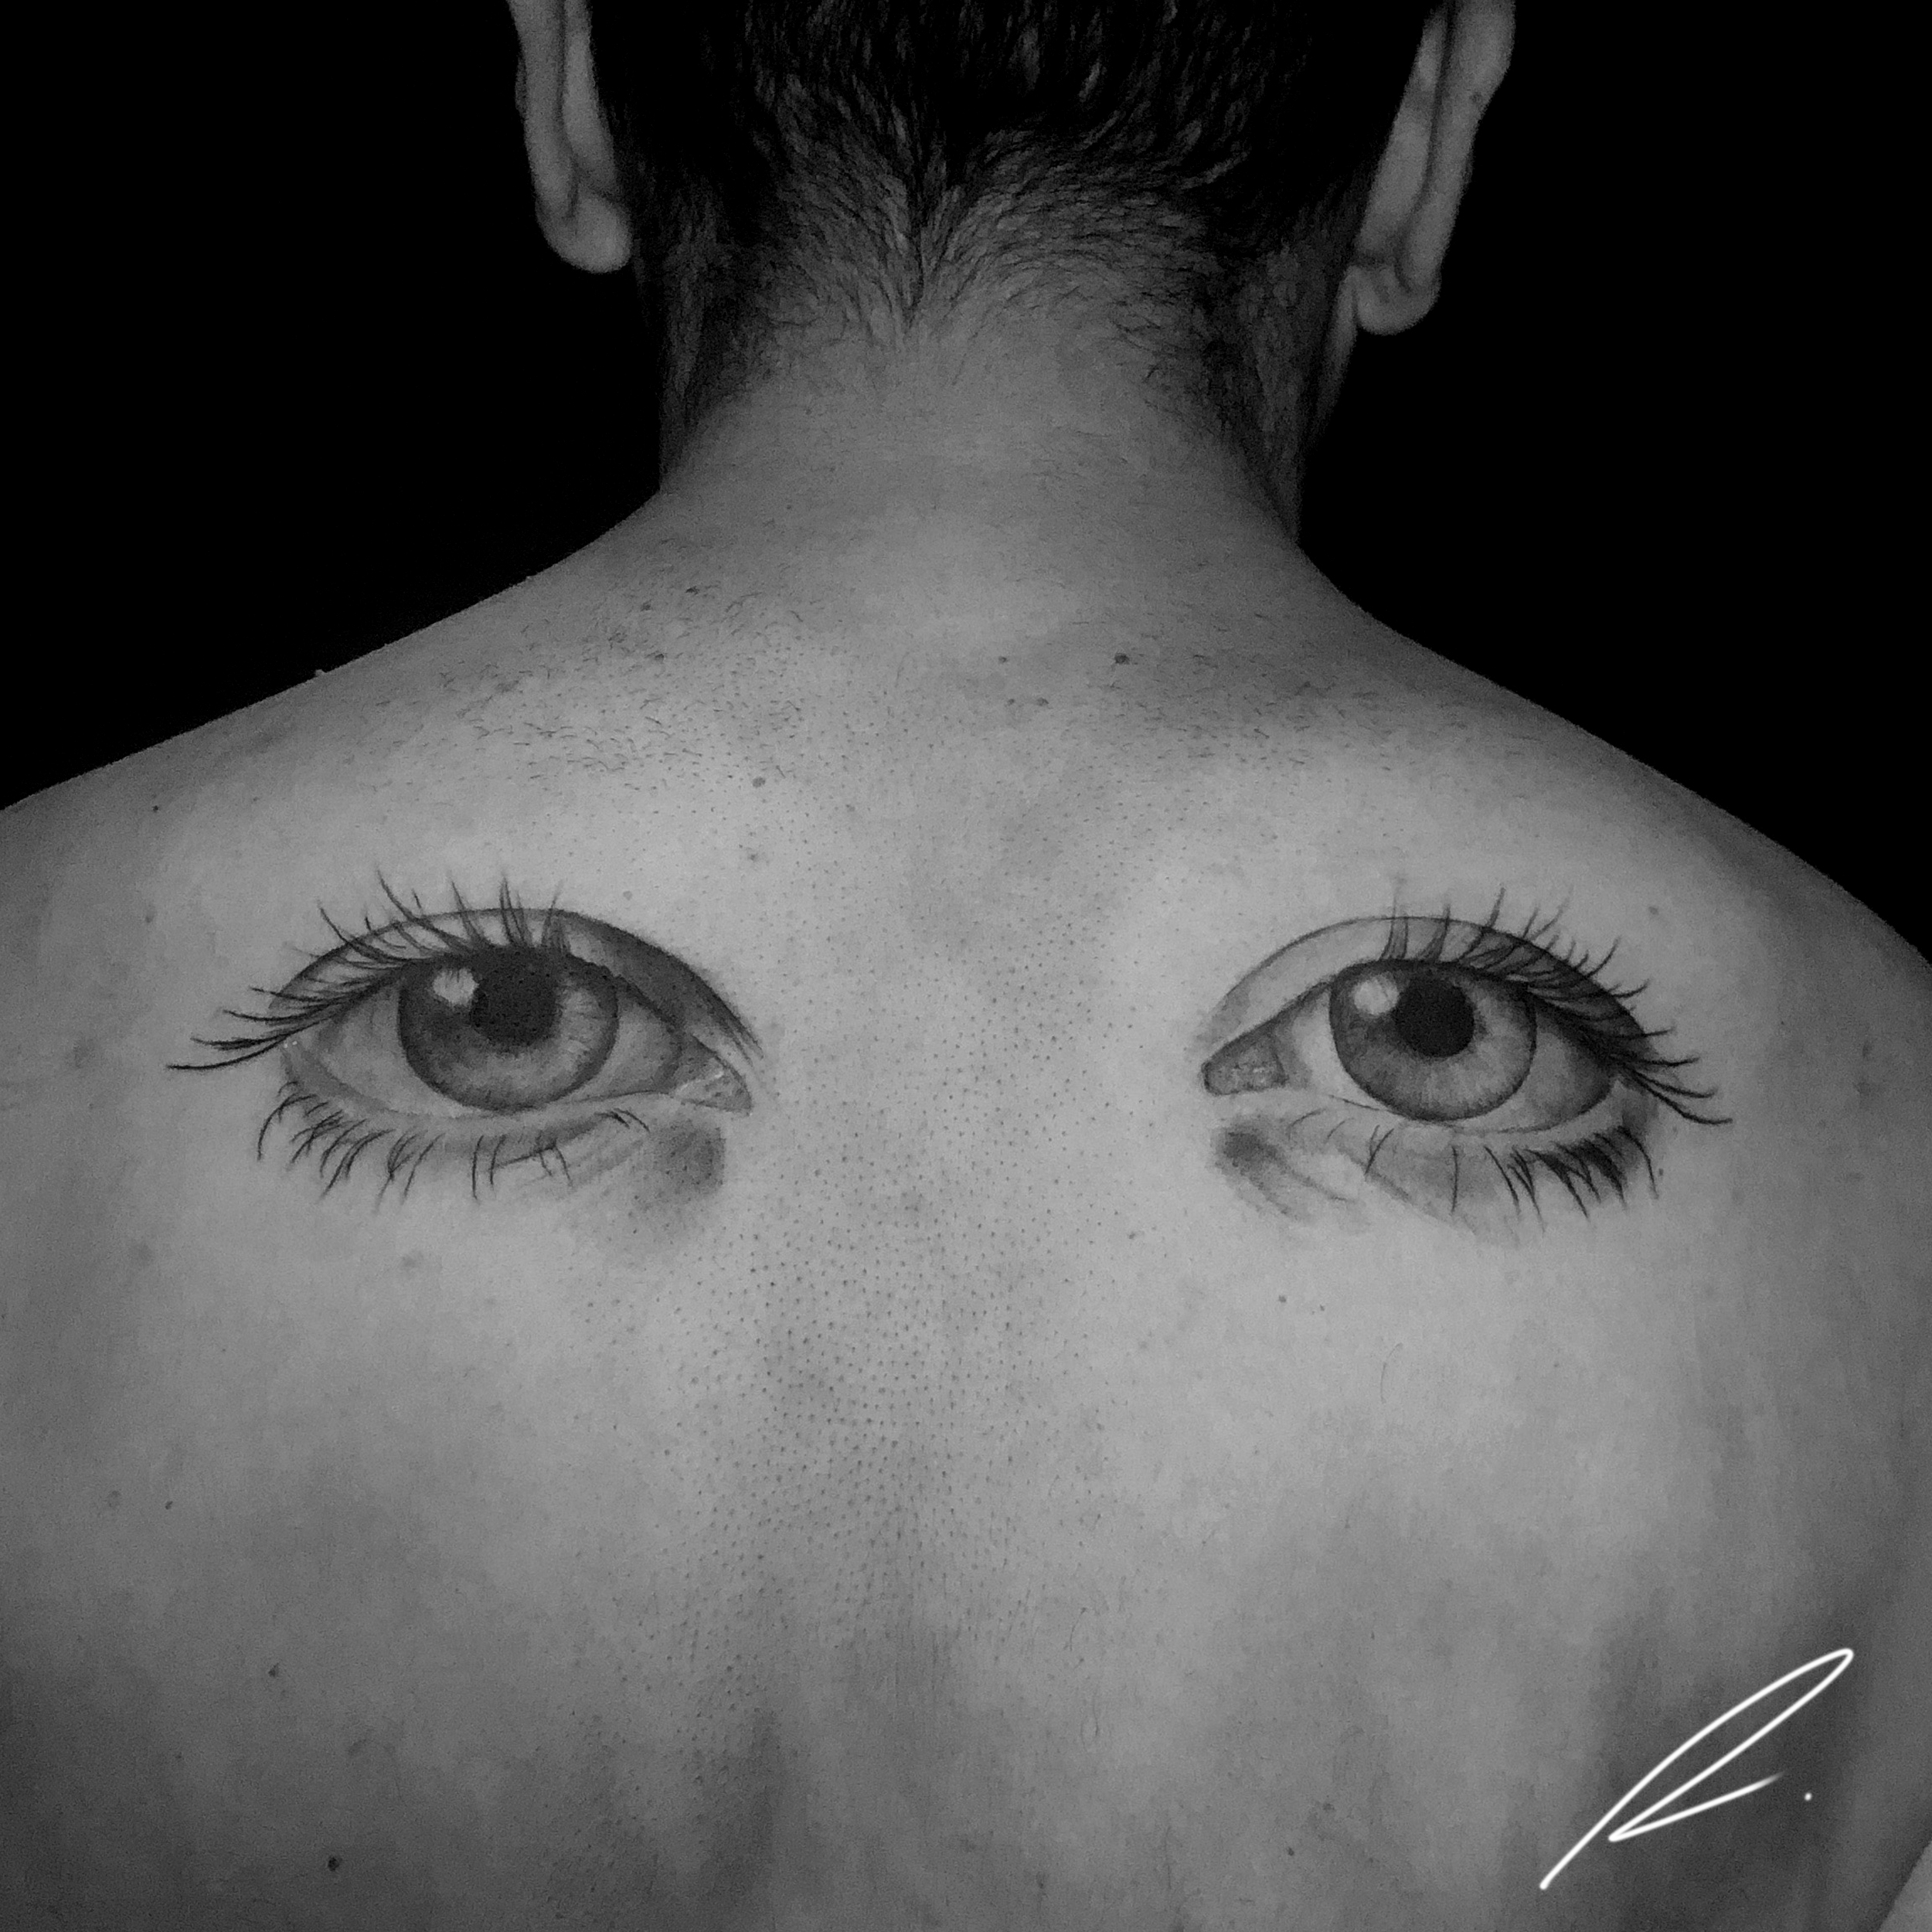 eyes_1